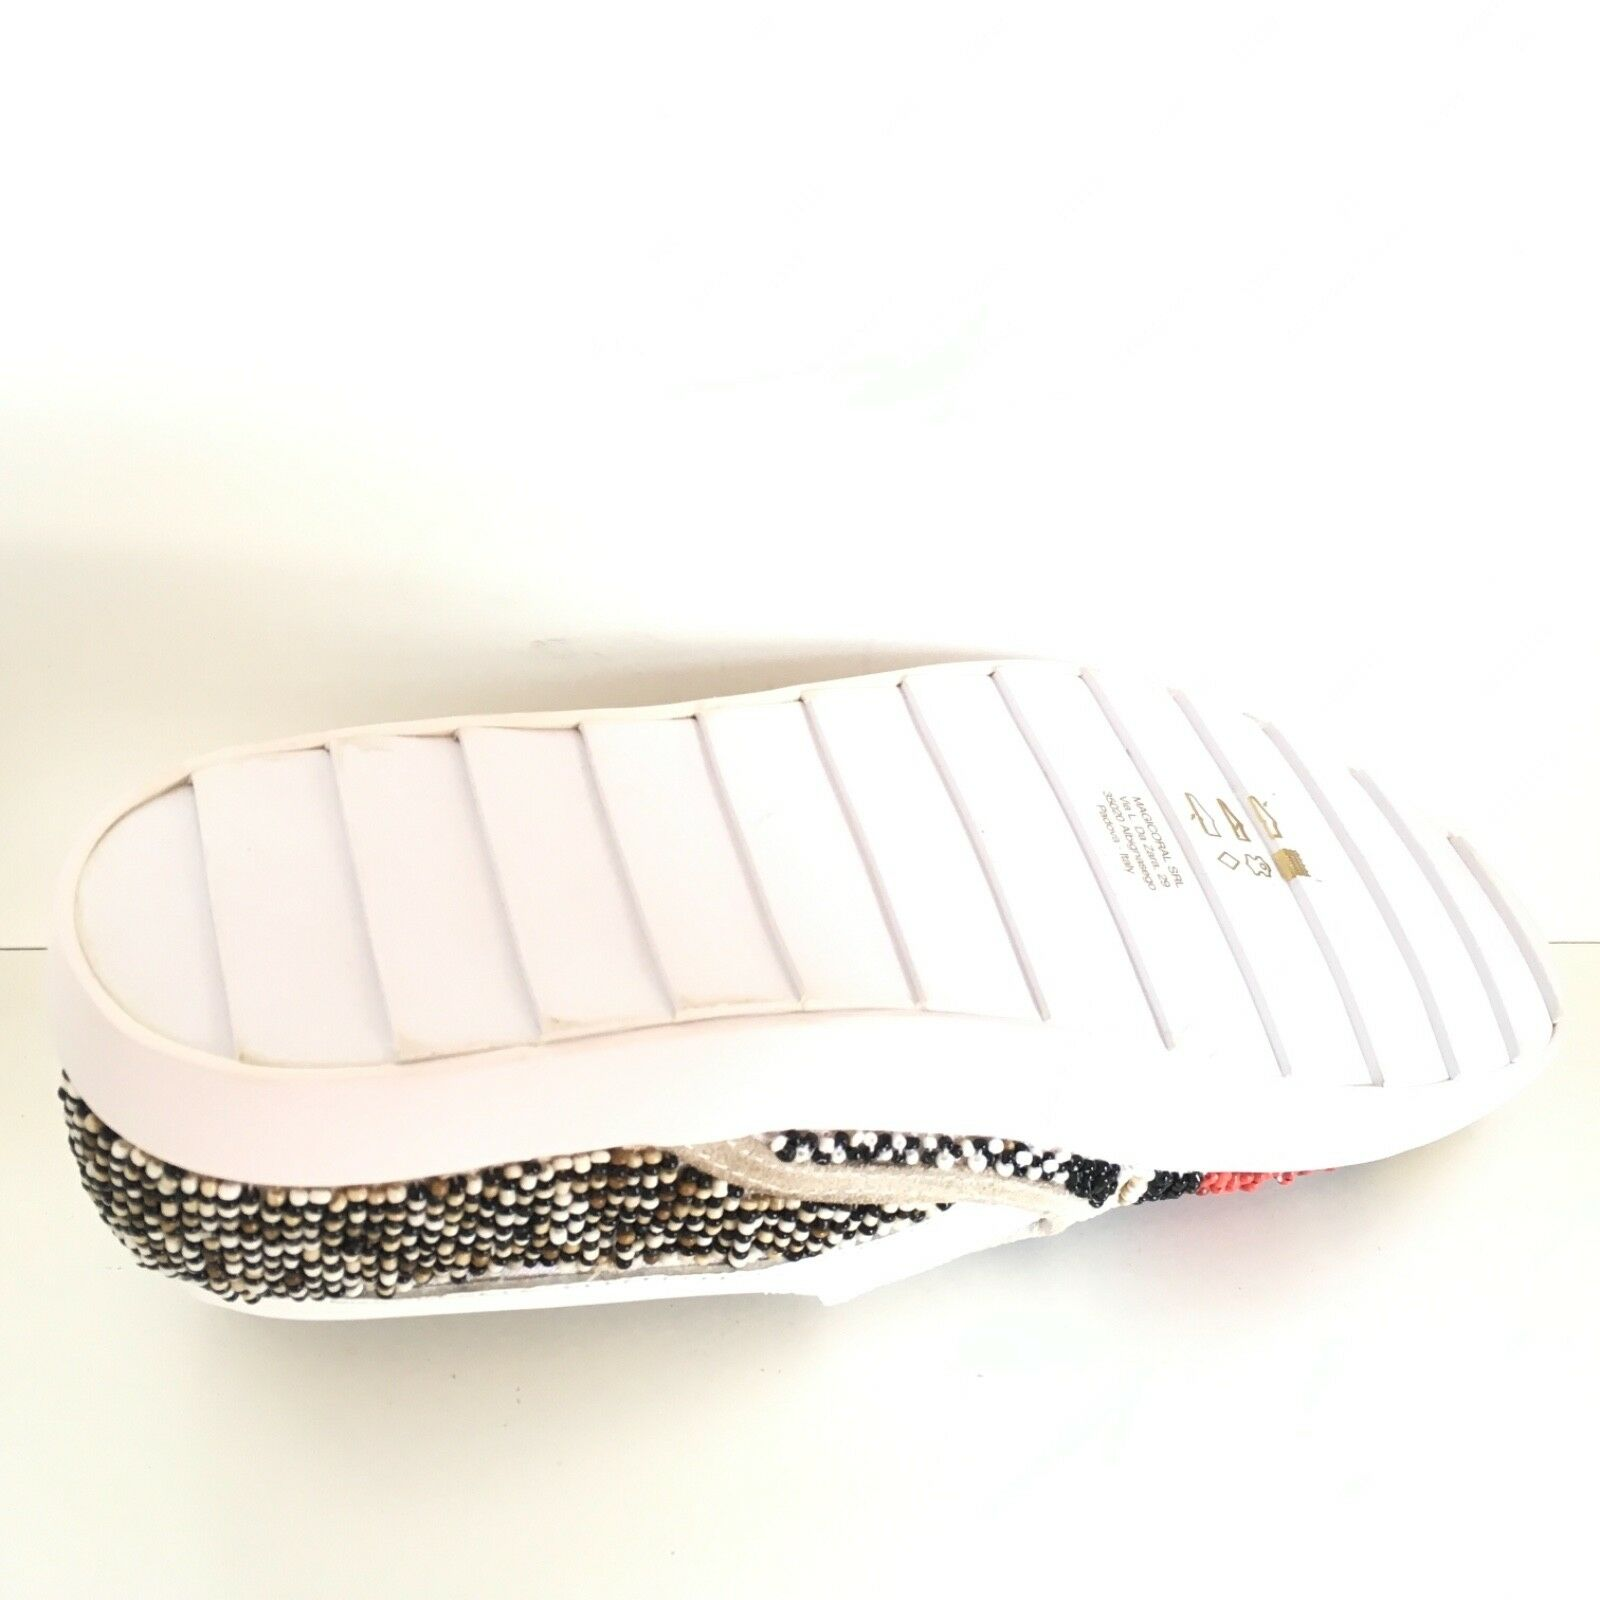 MALIPARMI scarpe Scarpe n. 36 MALW51 donna woman MALW51 36 multicolore tessuto punta gialla 82fbaf